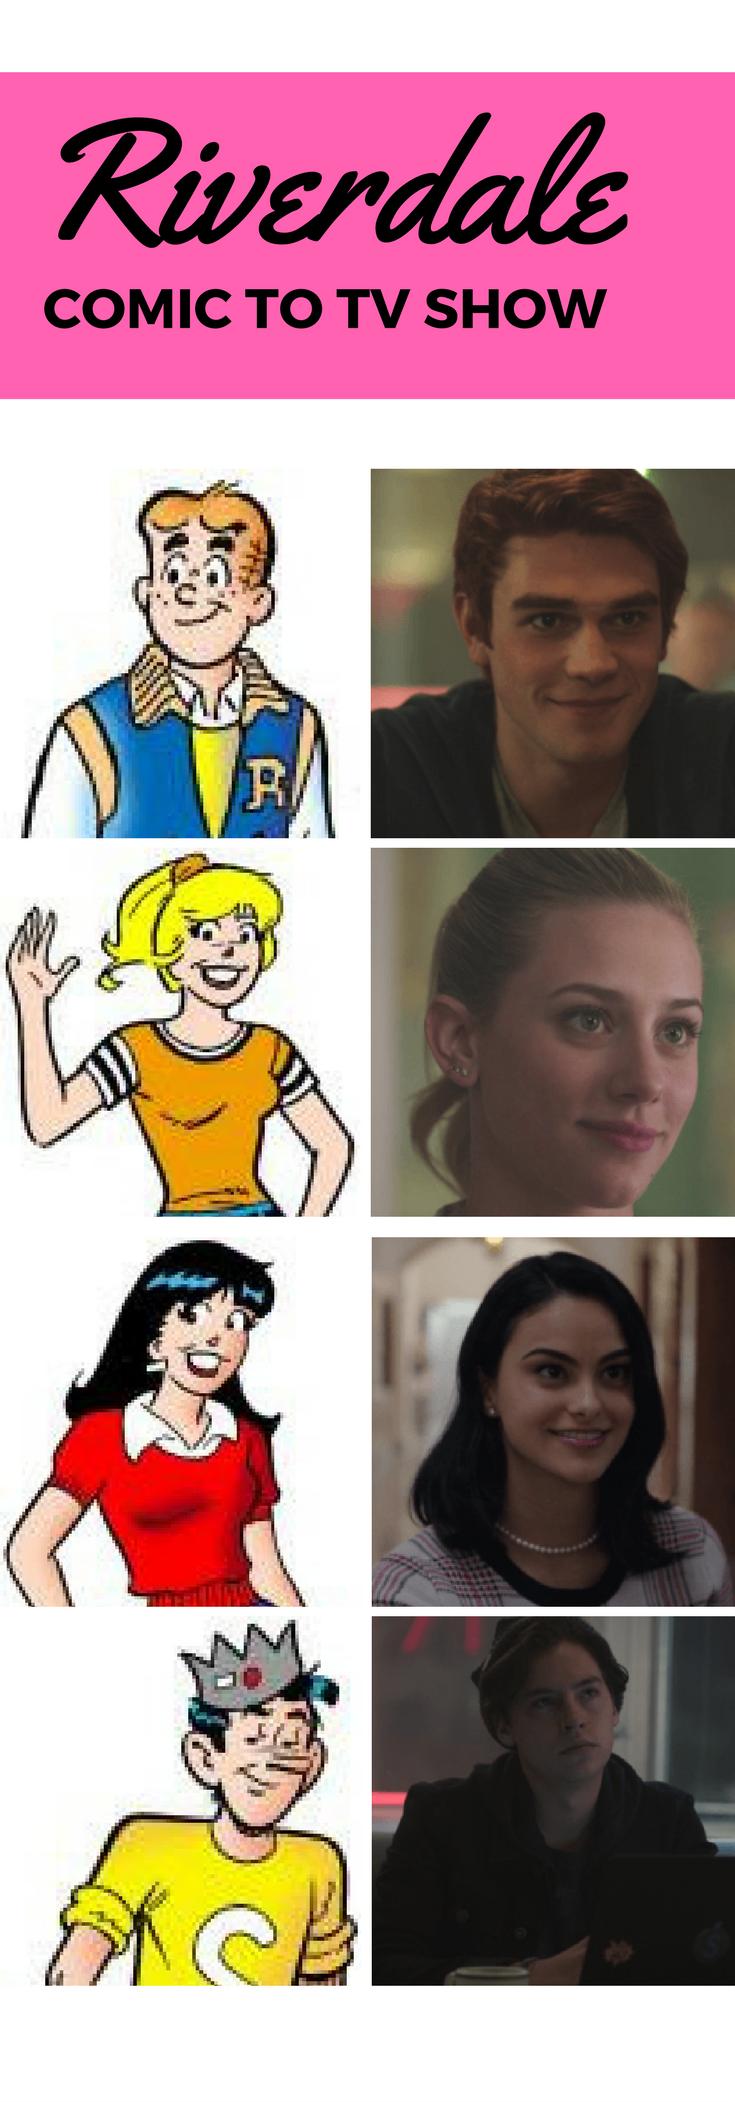 Riverdale Archie Comics Based Tv